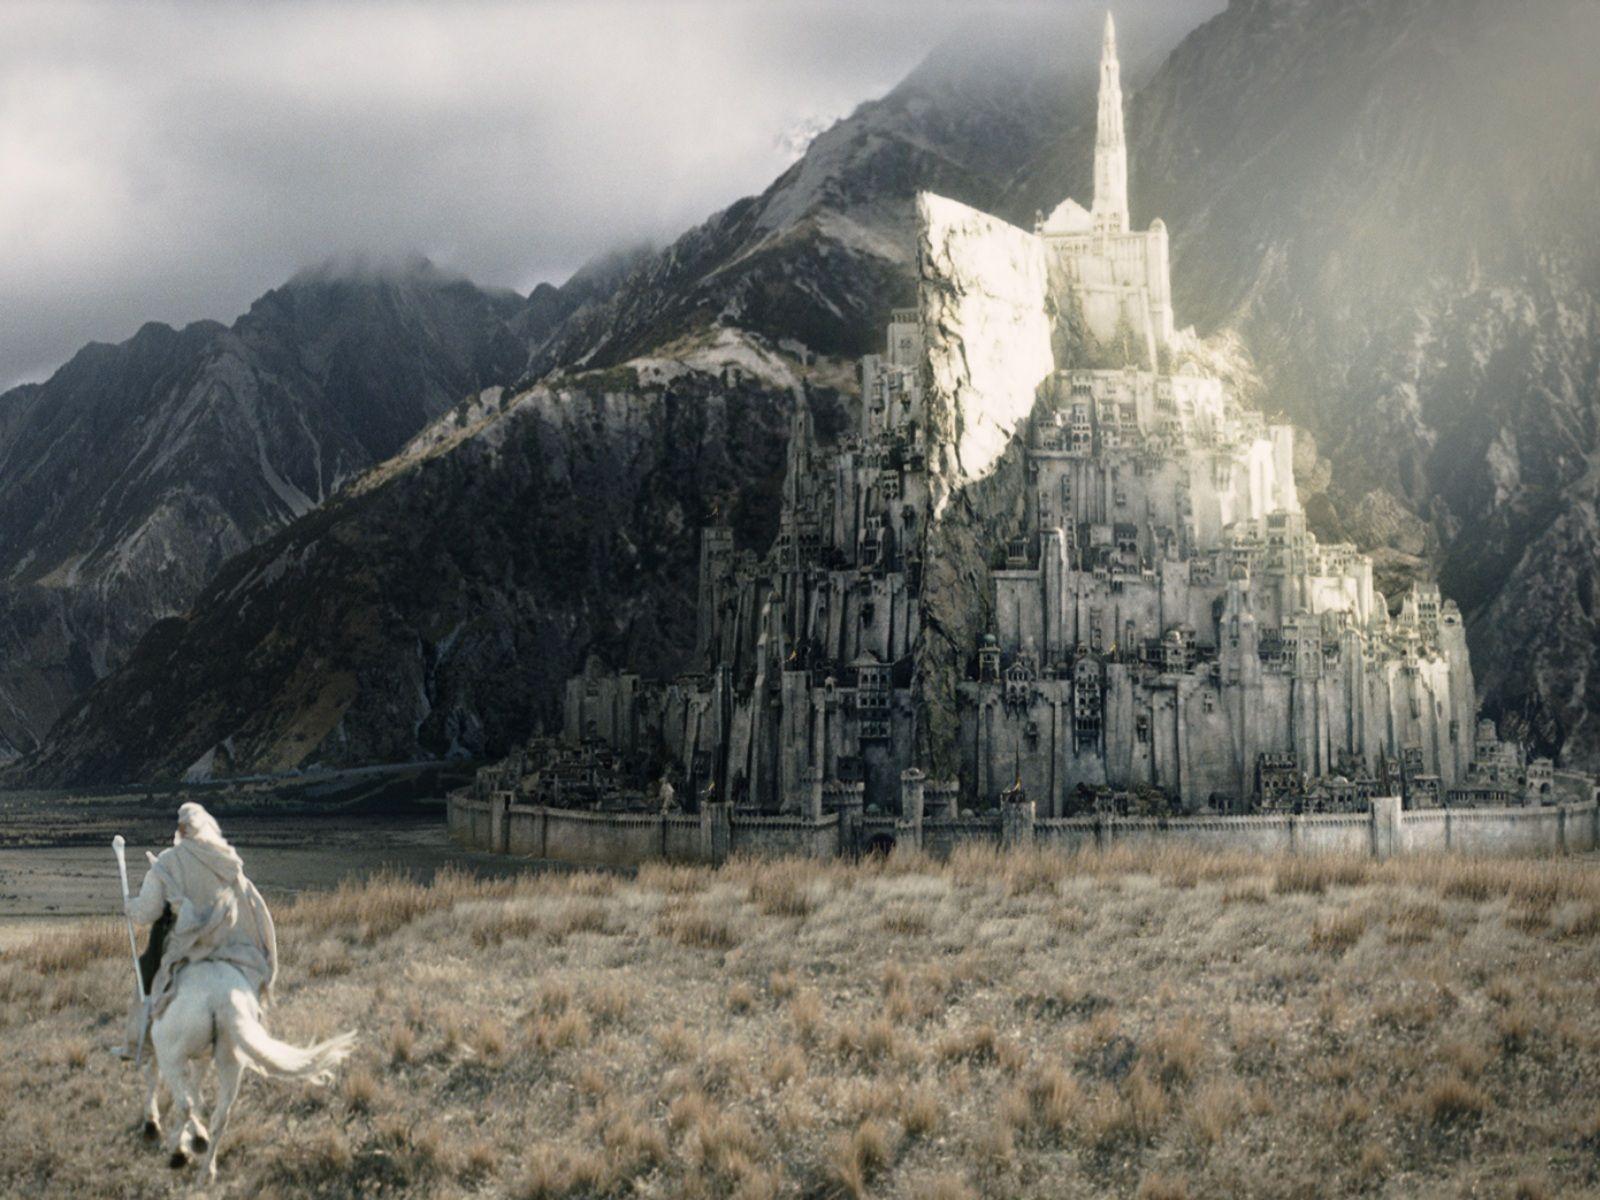 Gandalf Gondor Ian Mckellen Minas Tirith The Lord of the